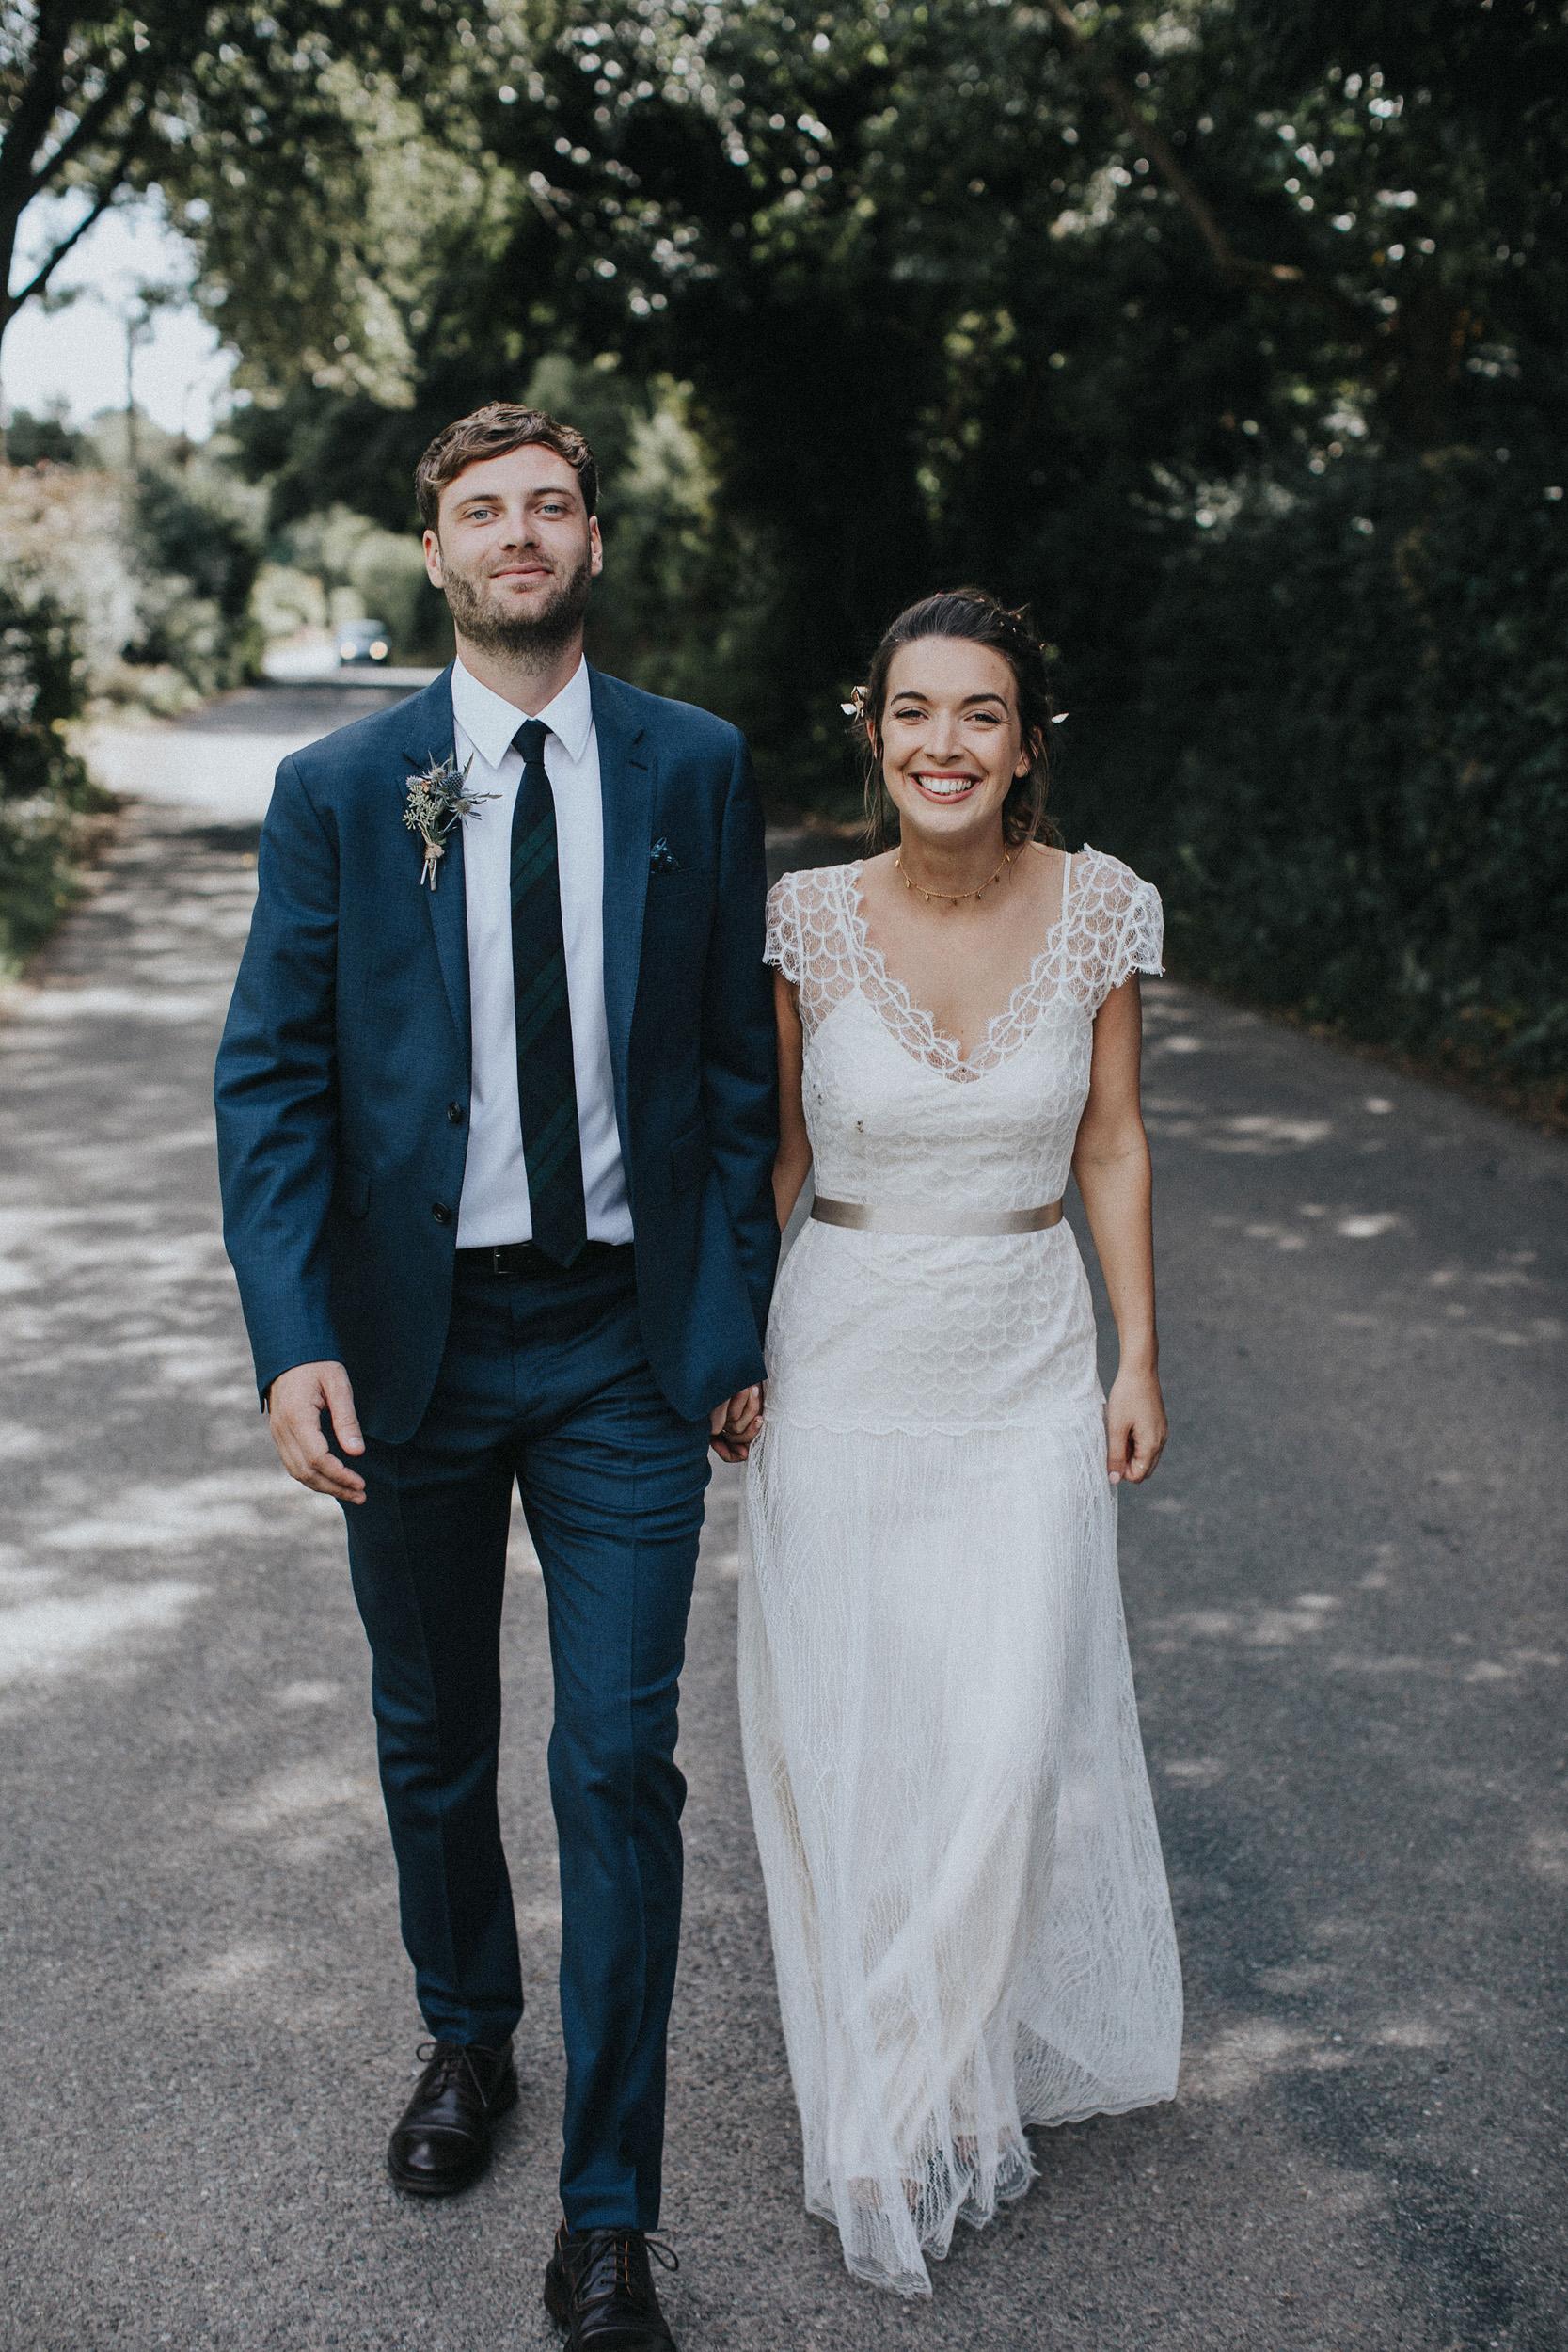 Martha-Laid-Back-Garden-Wedding-Lace-Wedding-Dress-Bohemian-Kate-Beaumont-31.jpg